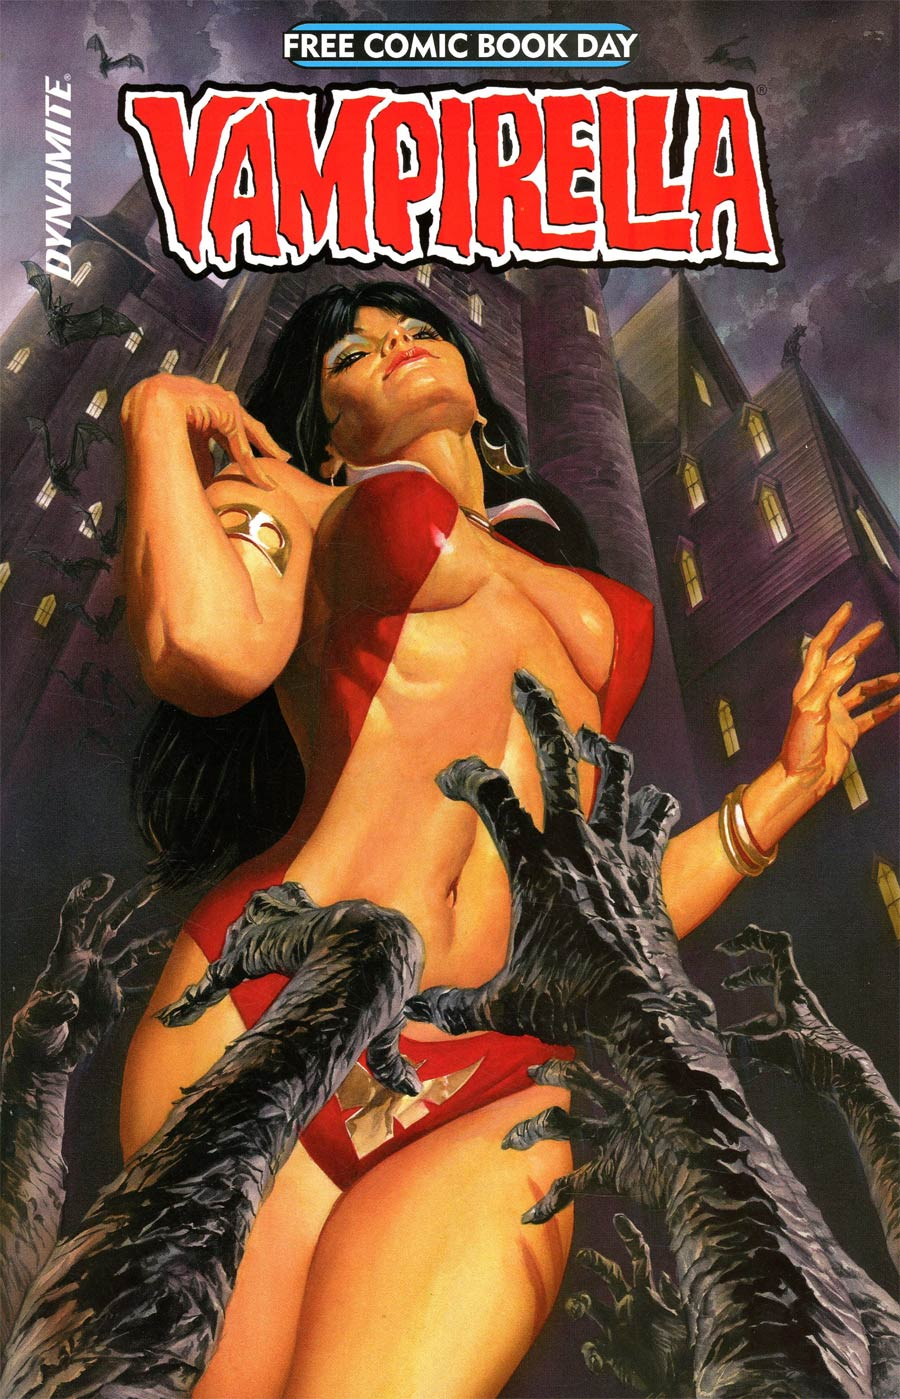 Vampirella Vol 8 #1 FCBD 2021 Edition